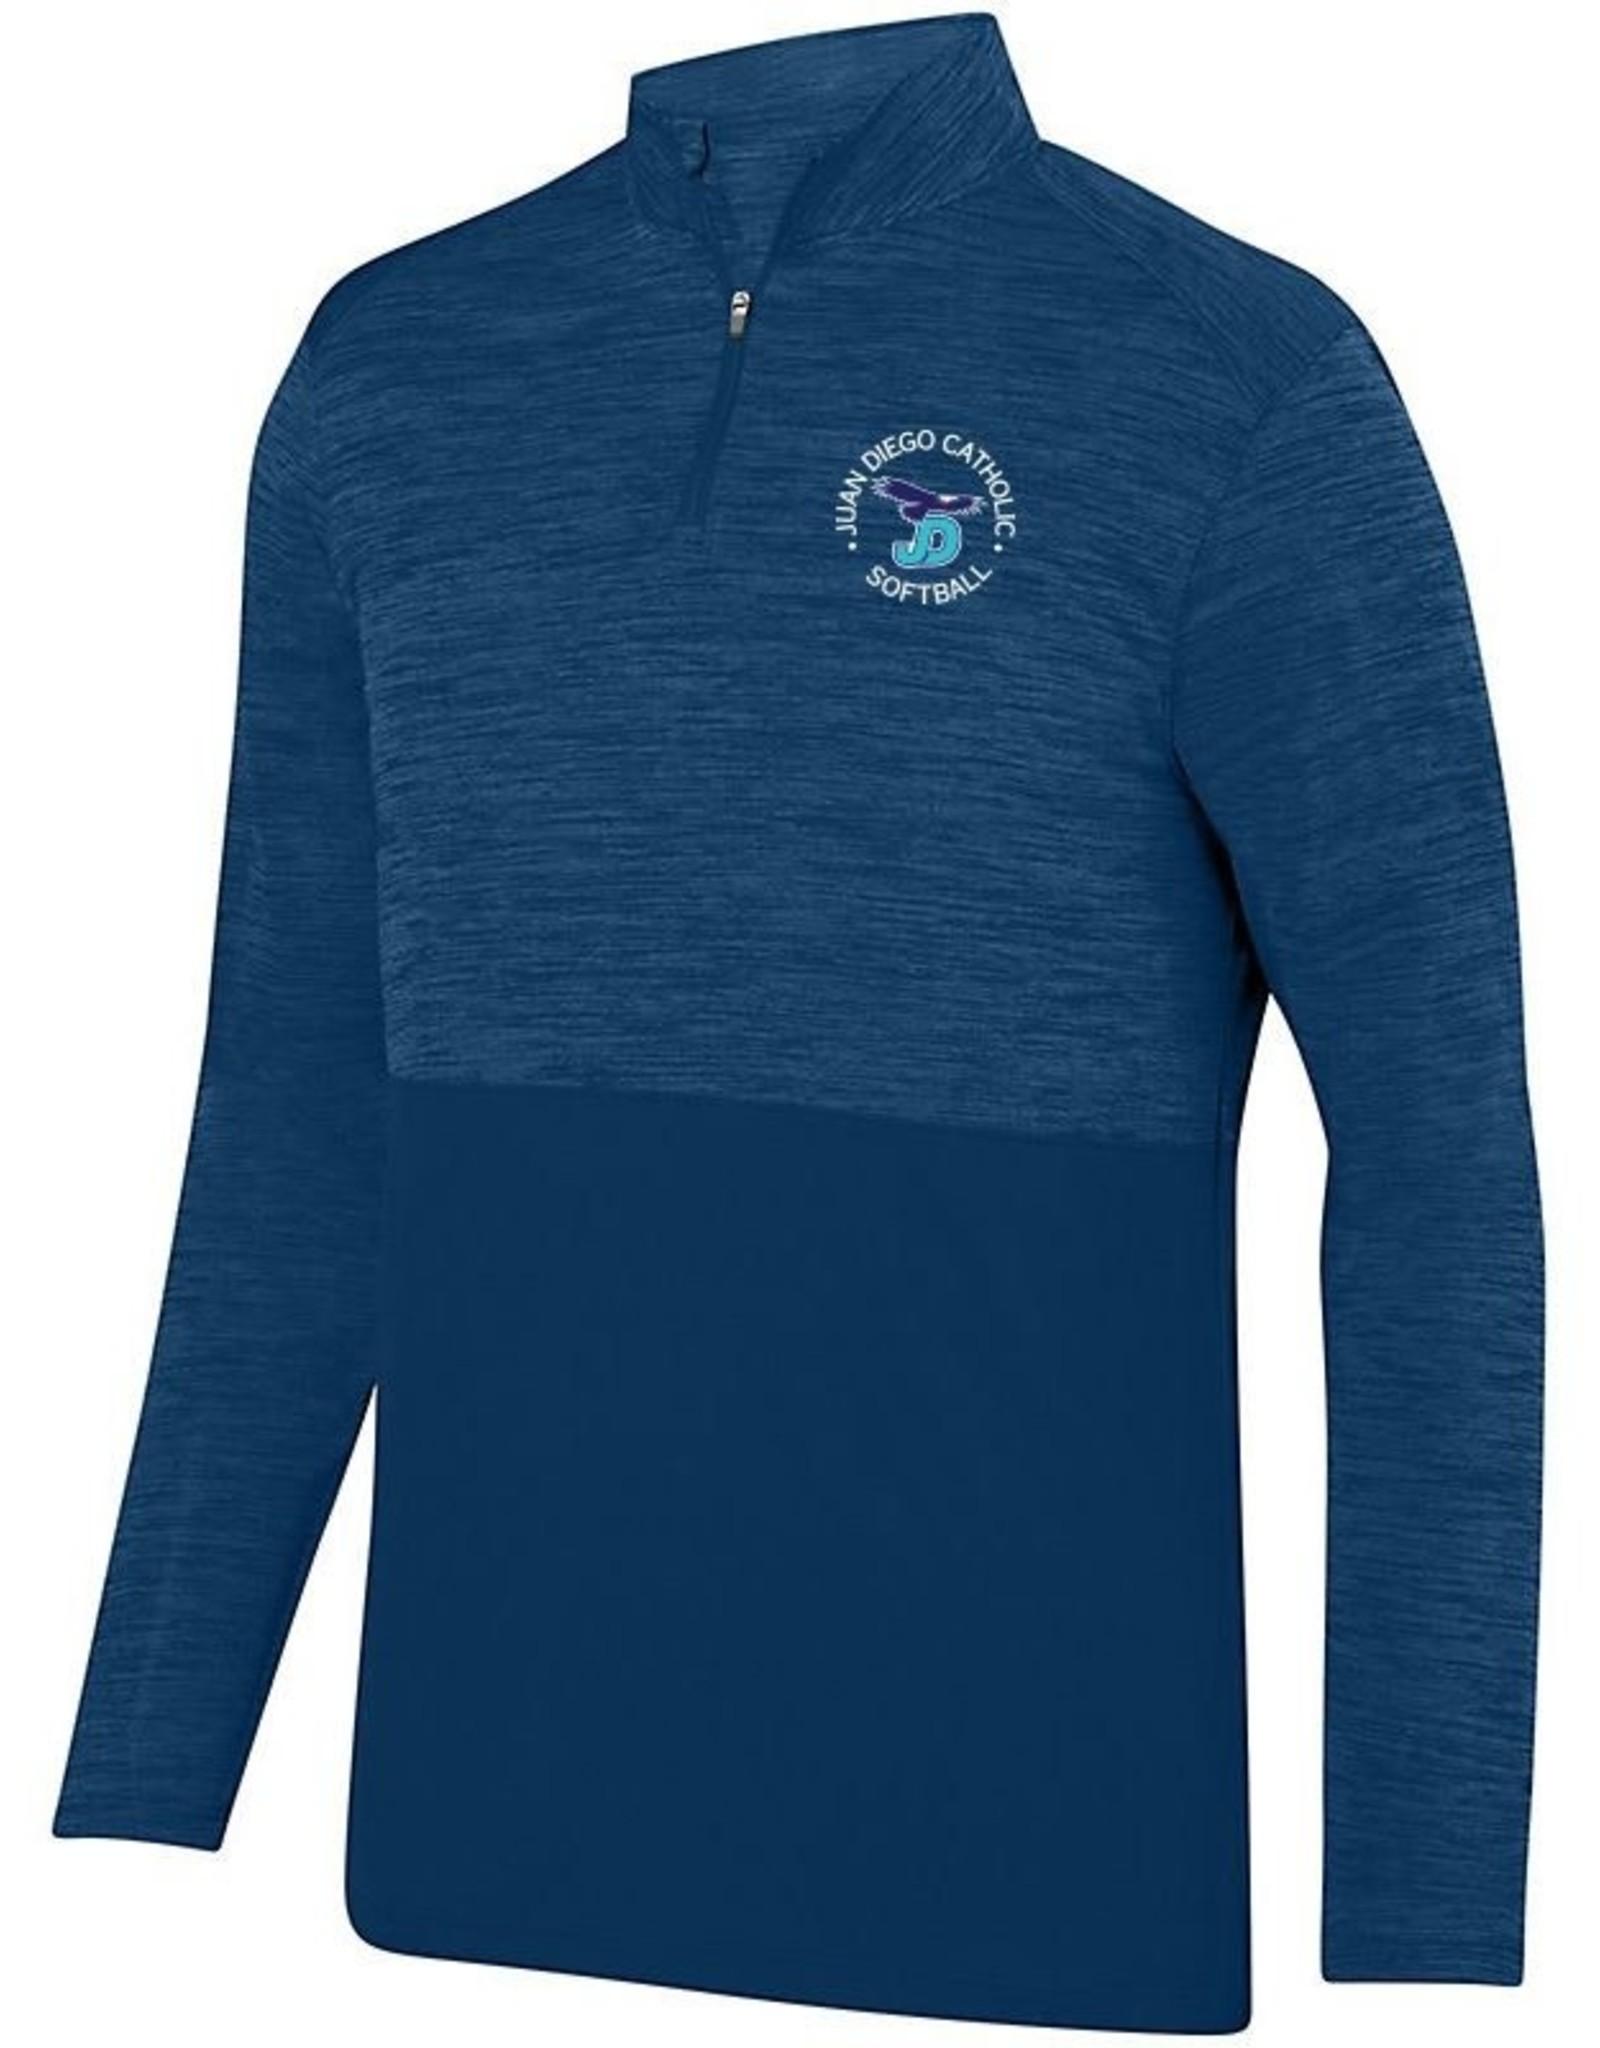 NON-UNIFORM Softball Navy Quarterzip embroidered with softball logo.